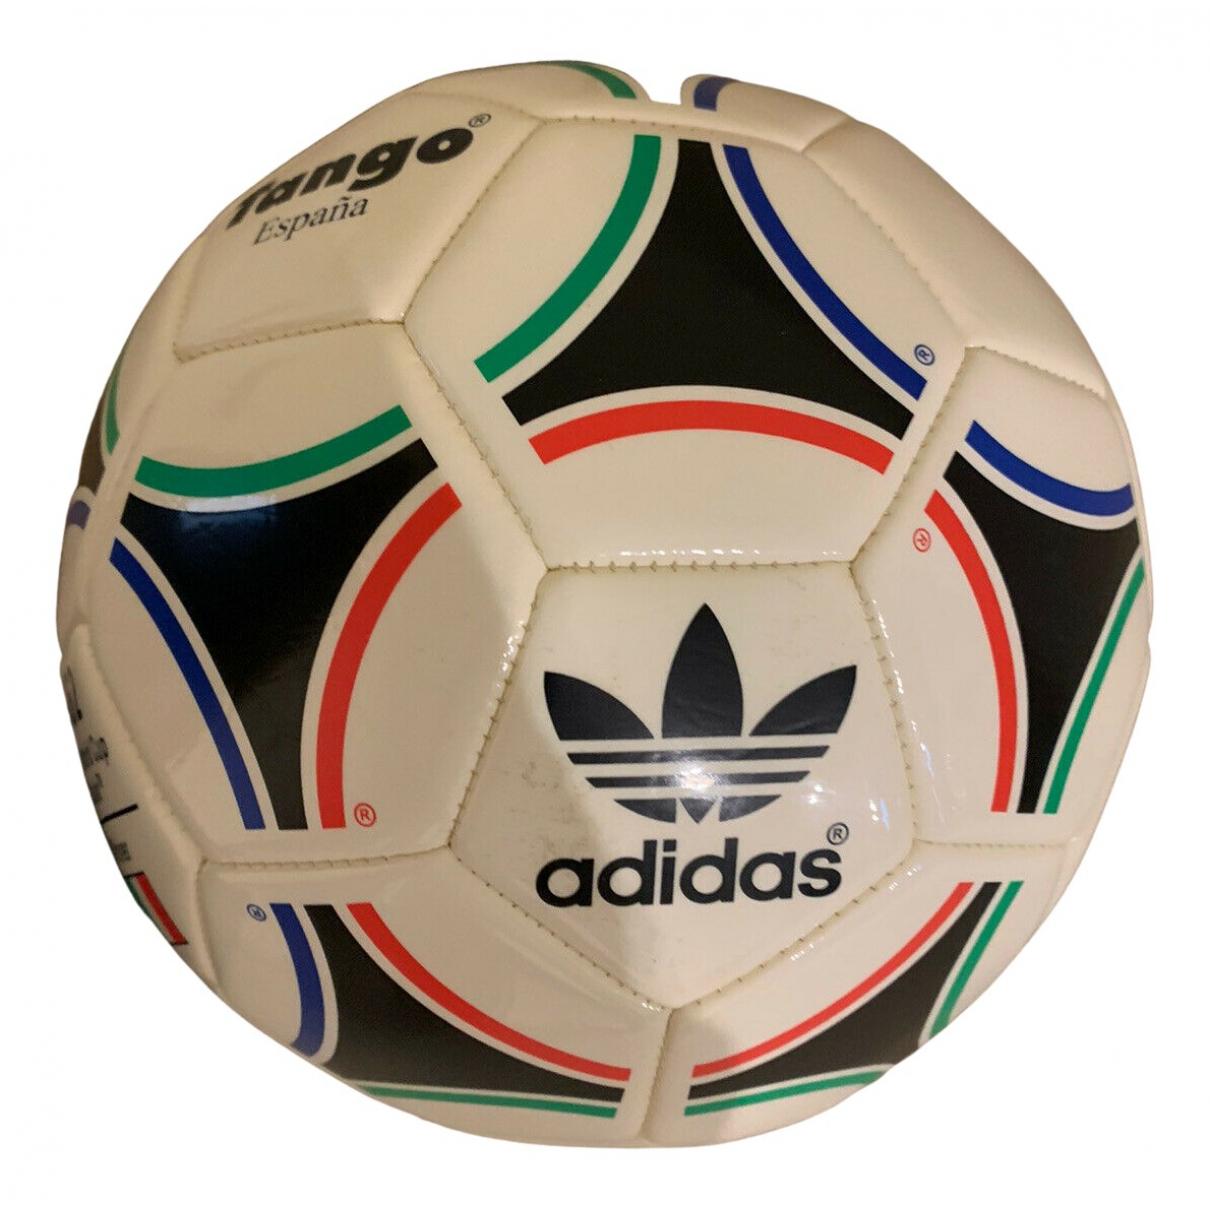 Adidas - Ballons   pour lifestyle en cuir - blanc